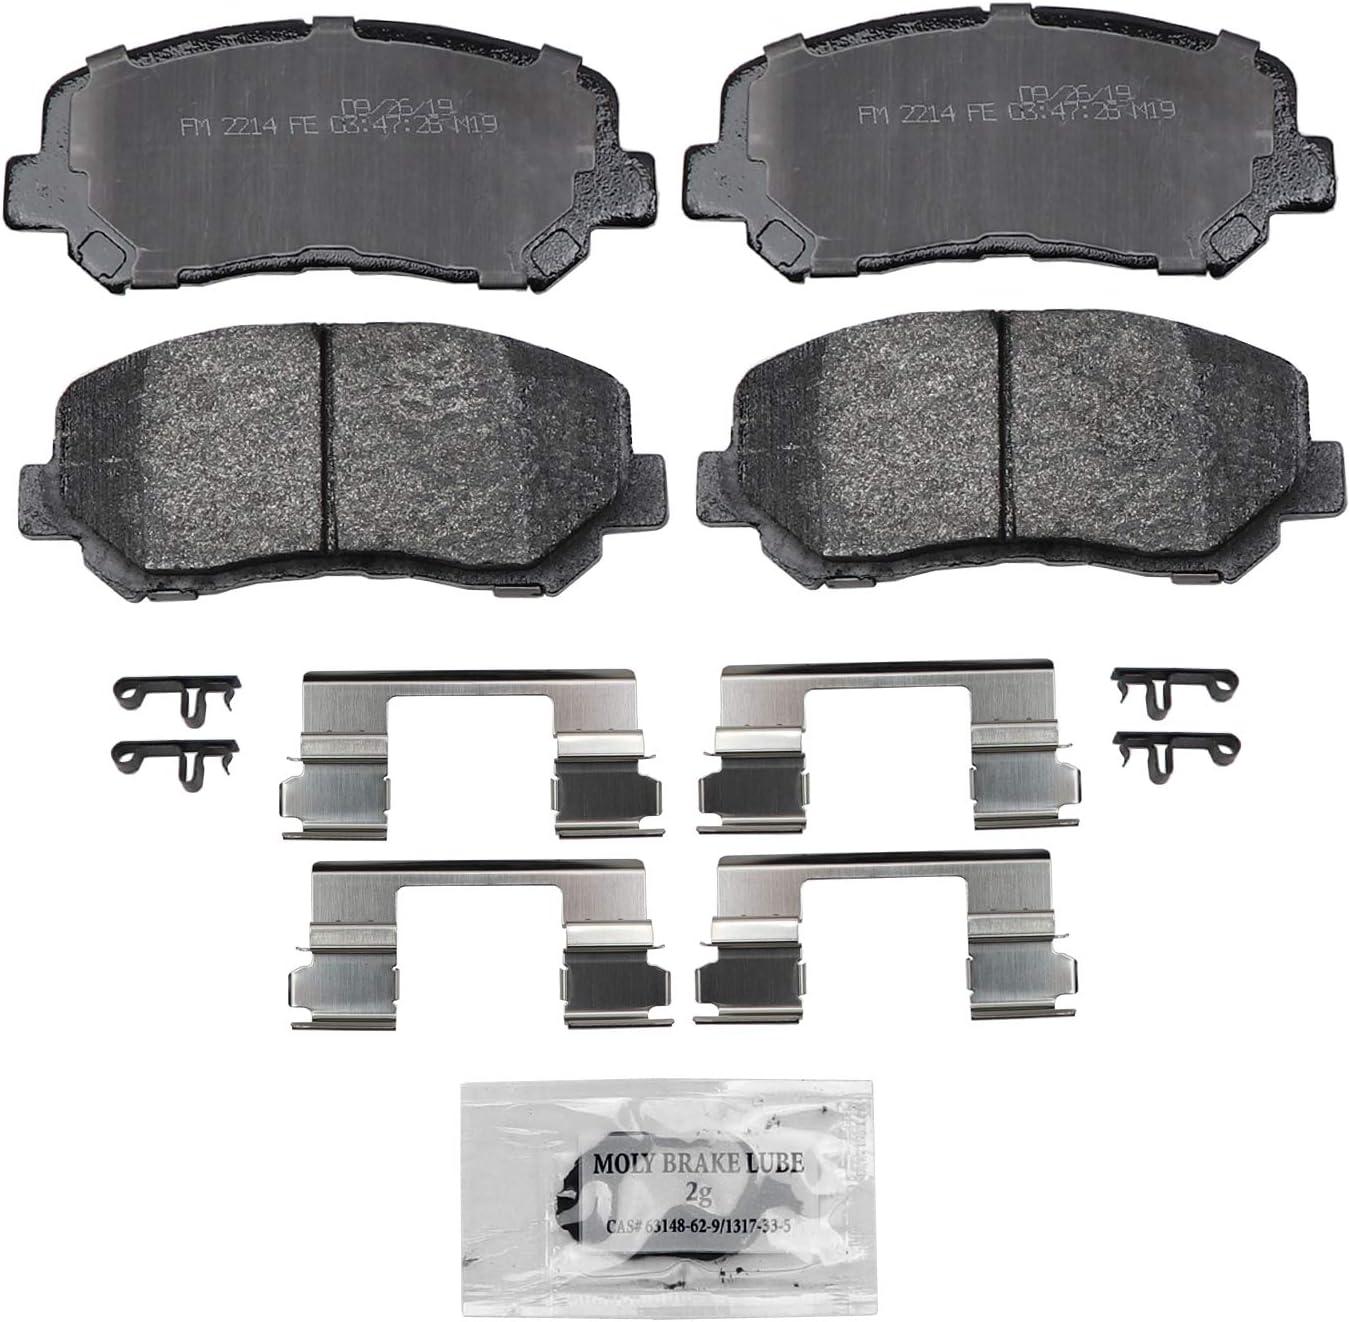 Wagner SevereDuty SX1640 Semi-Metallic Disc Brake Pad Set